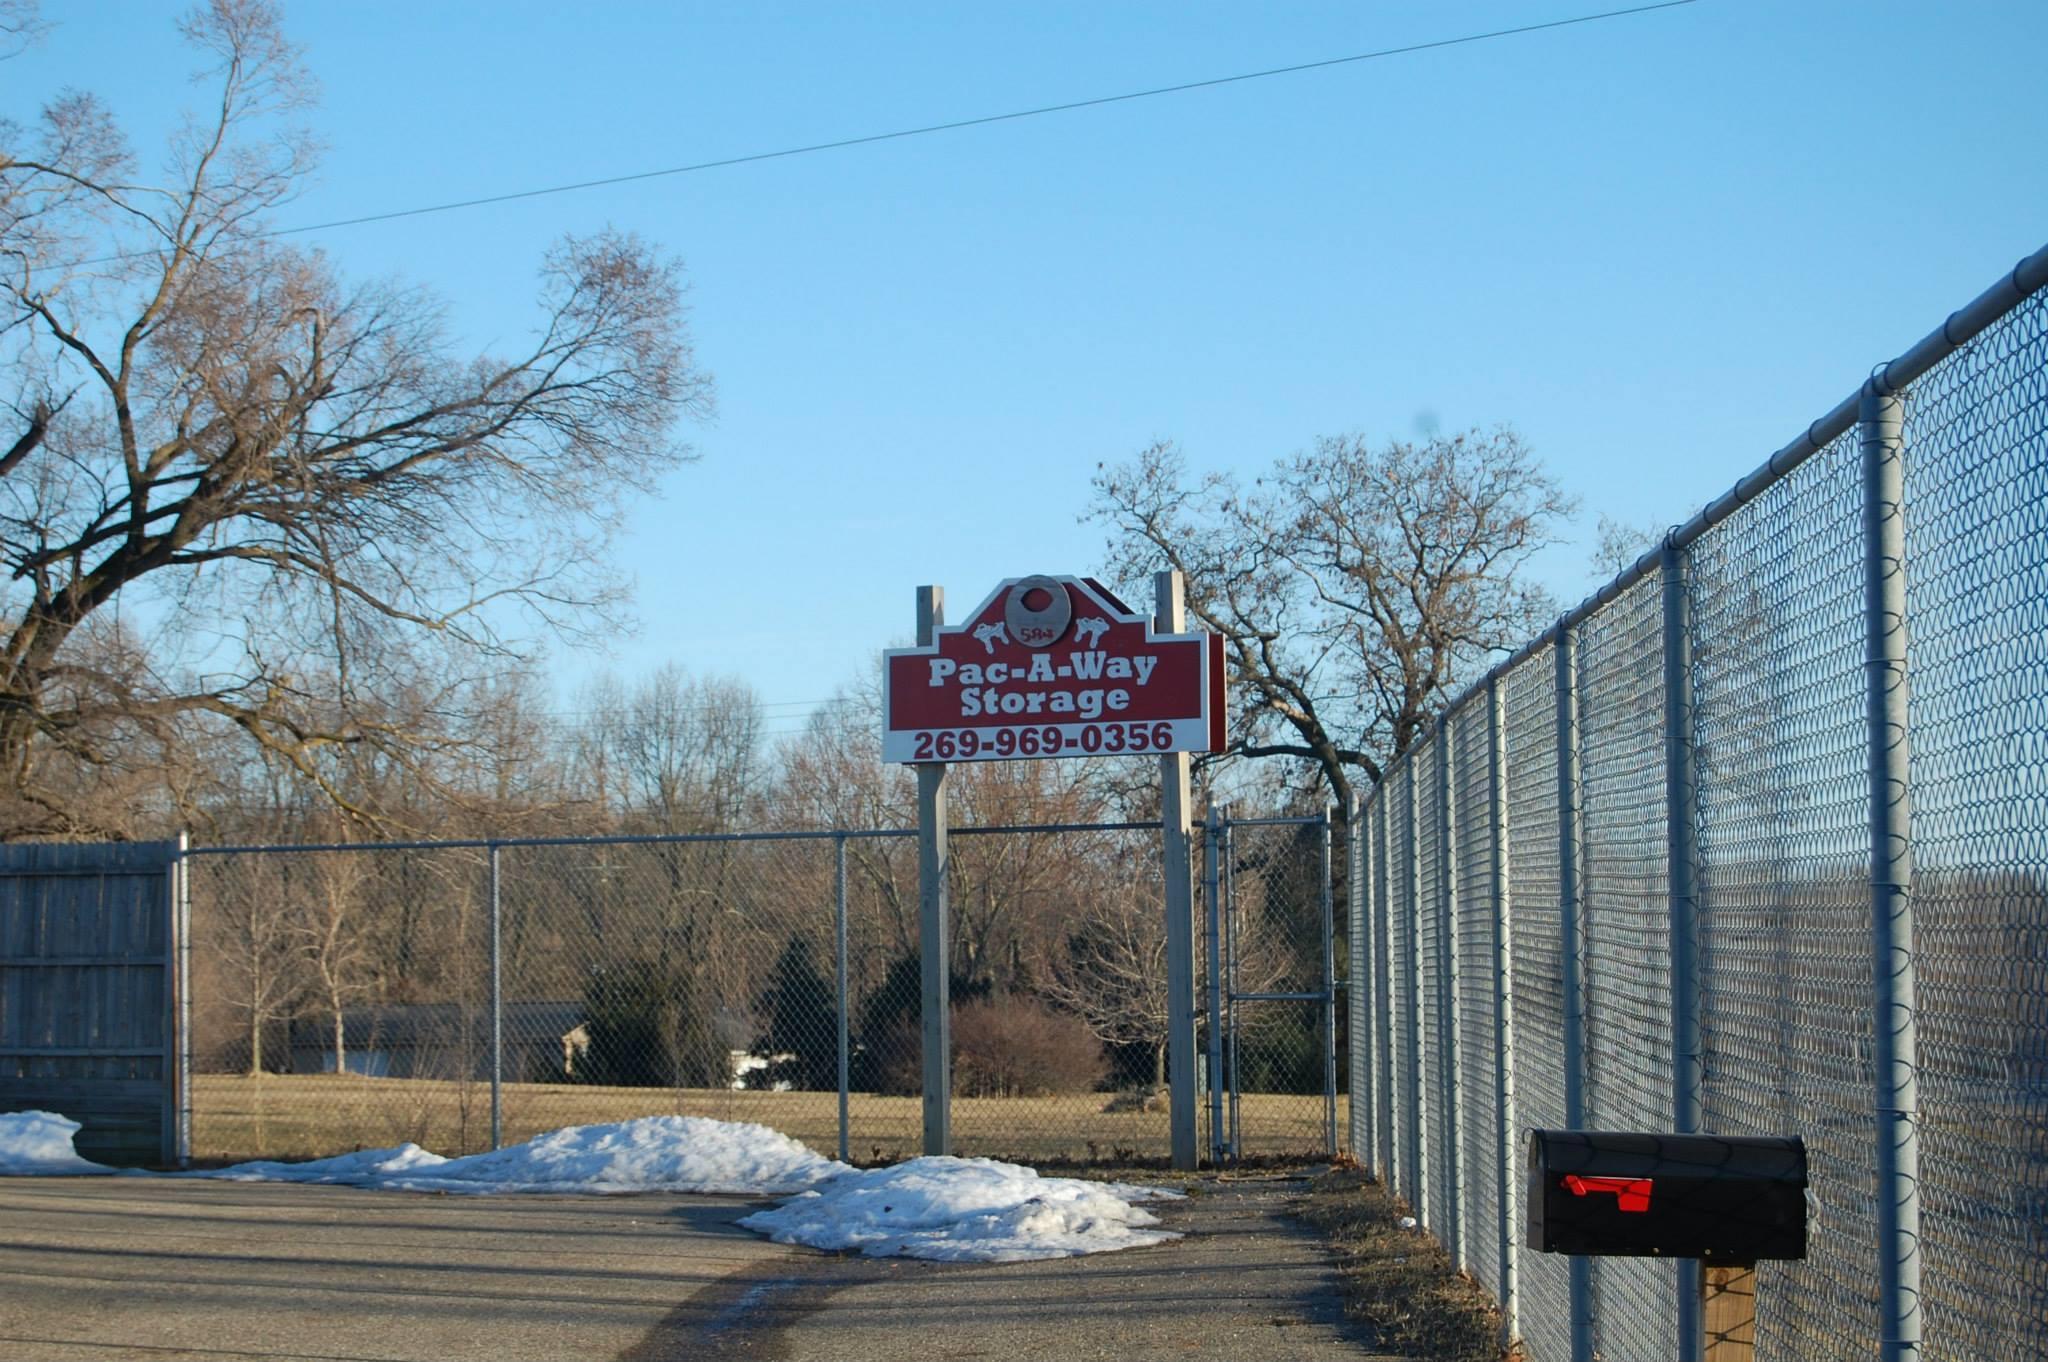 Battle Creek, MI 49017